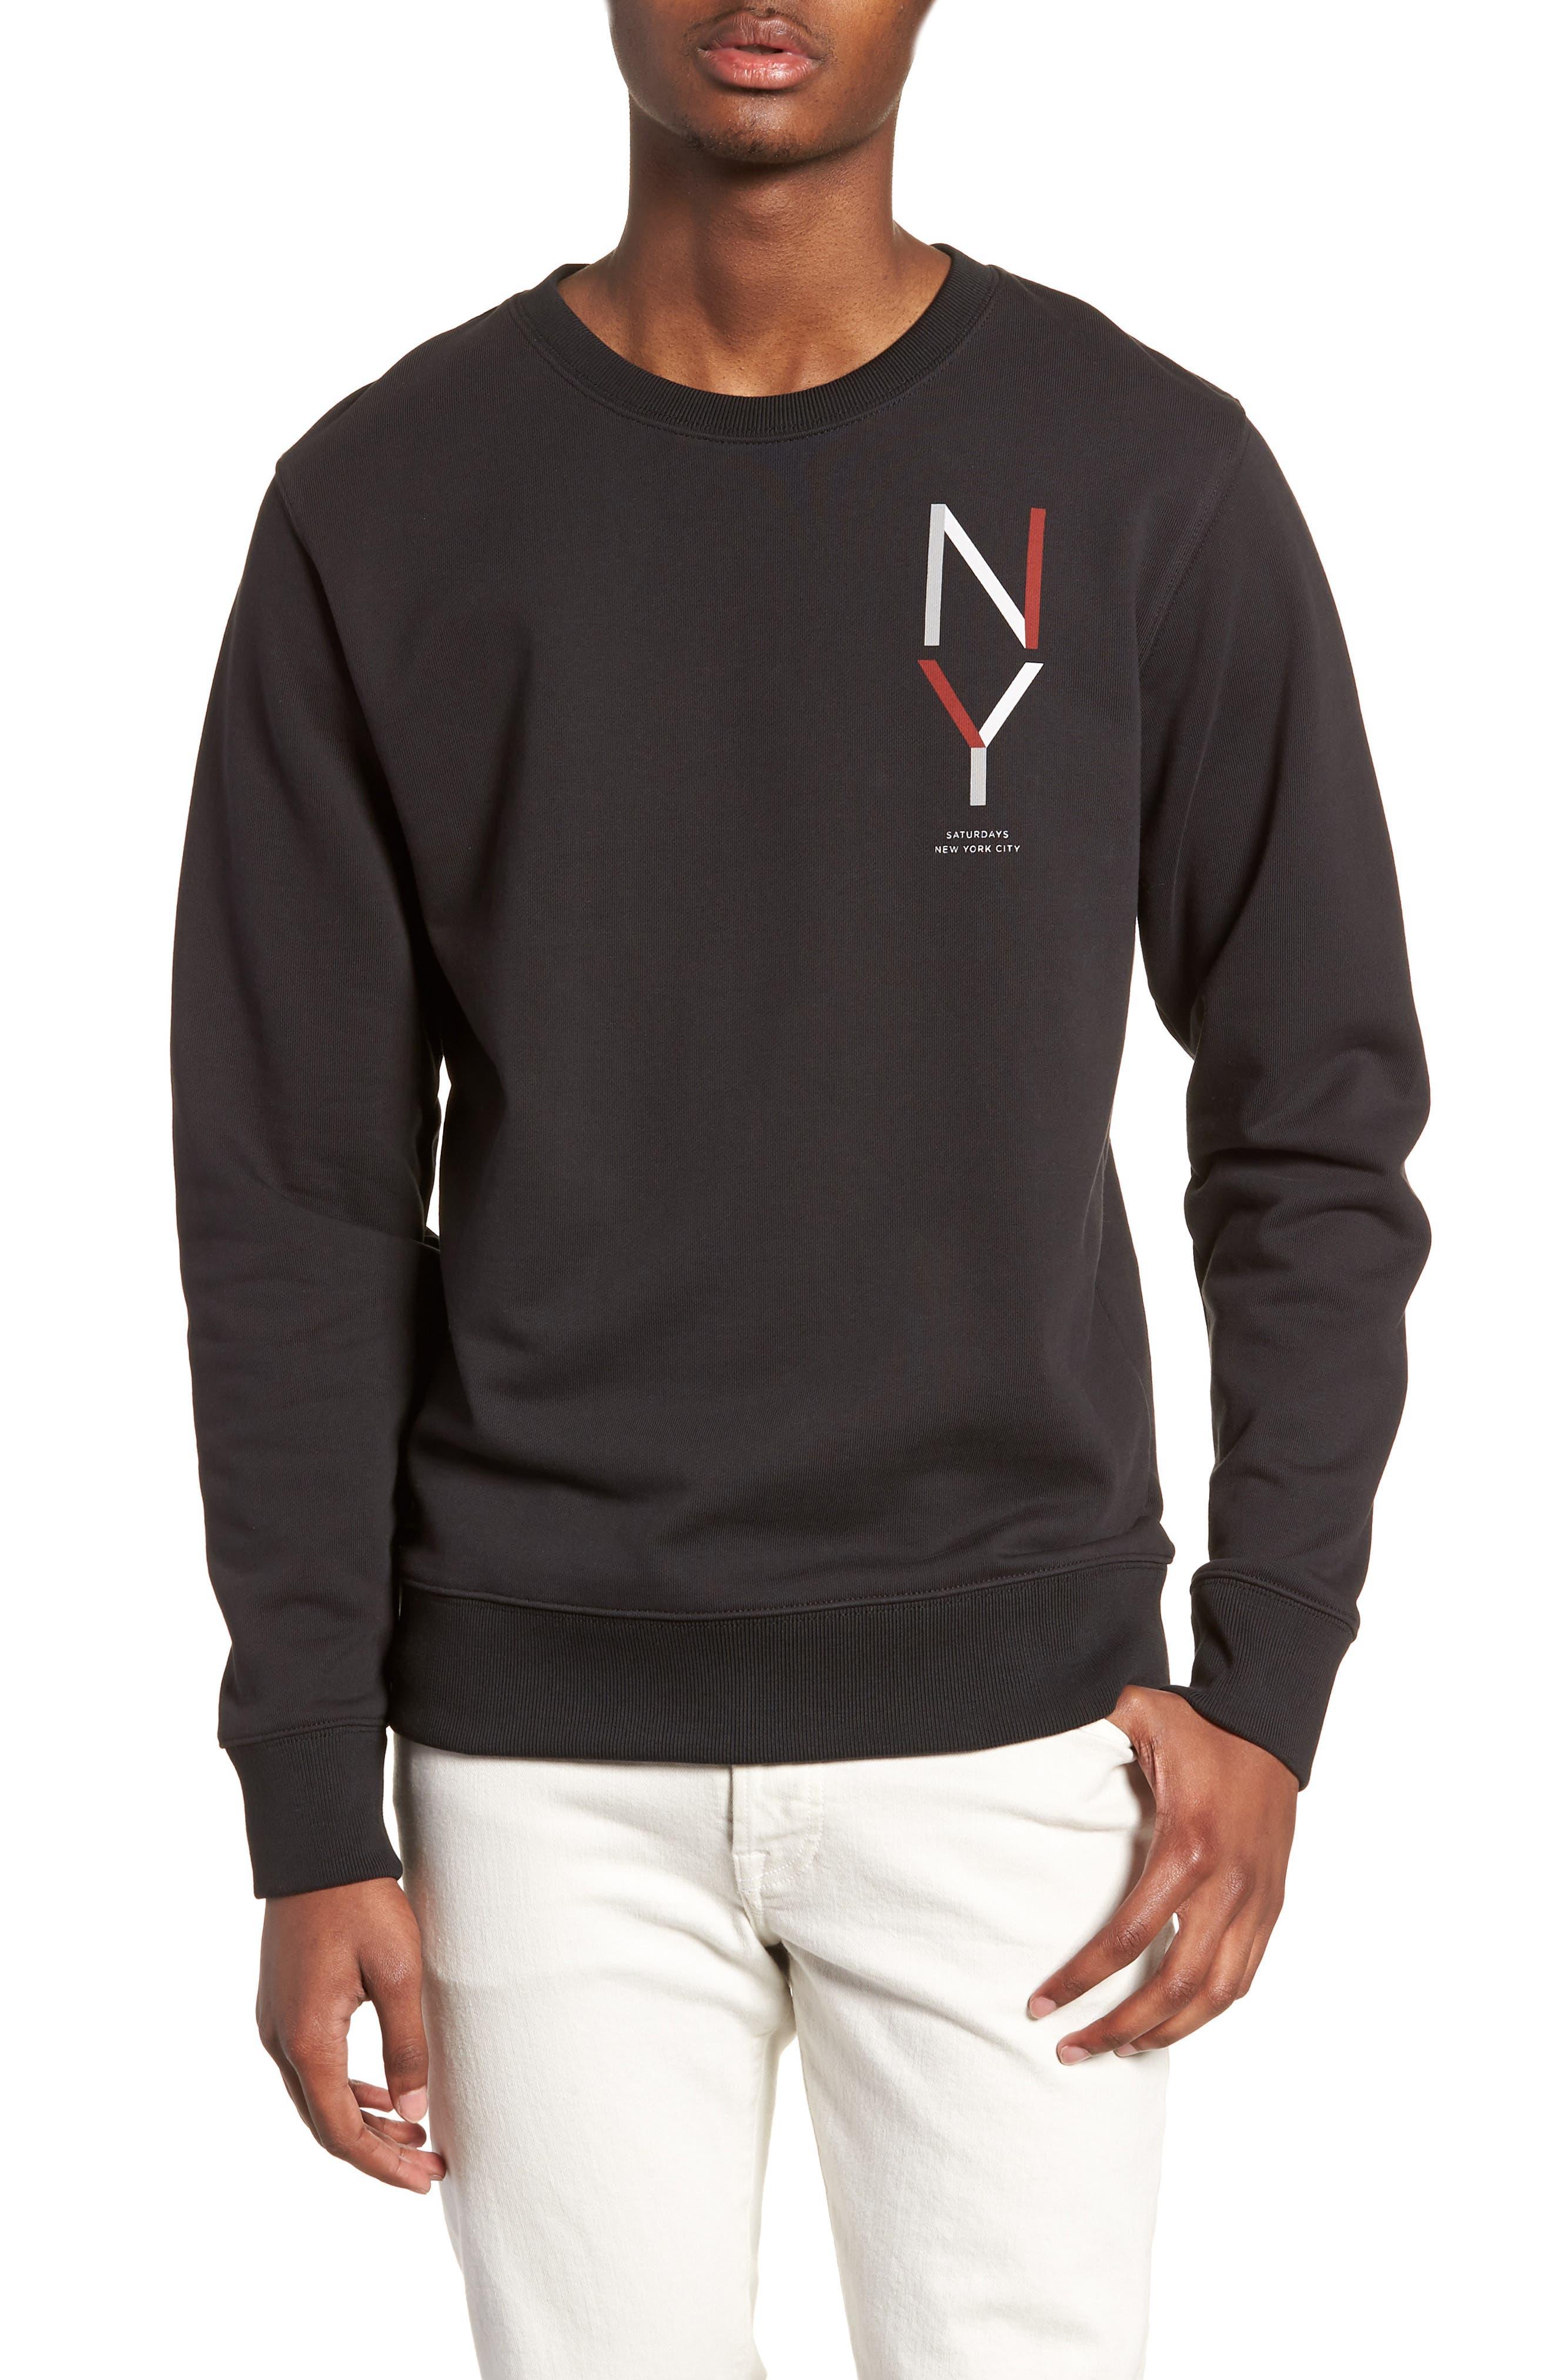 Bowery NY Sweatshirt,                             Main thumbnail 1, color,                             001